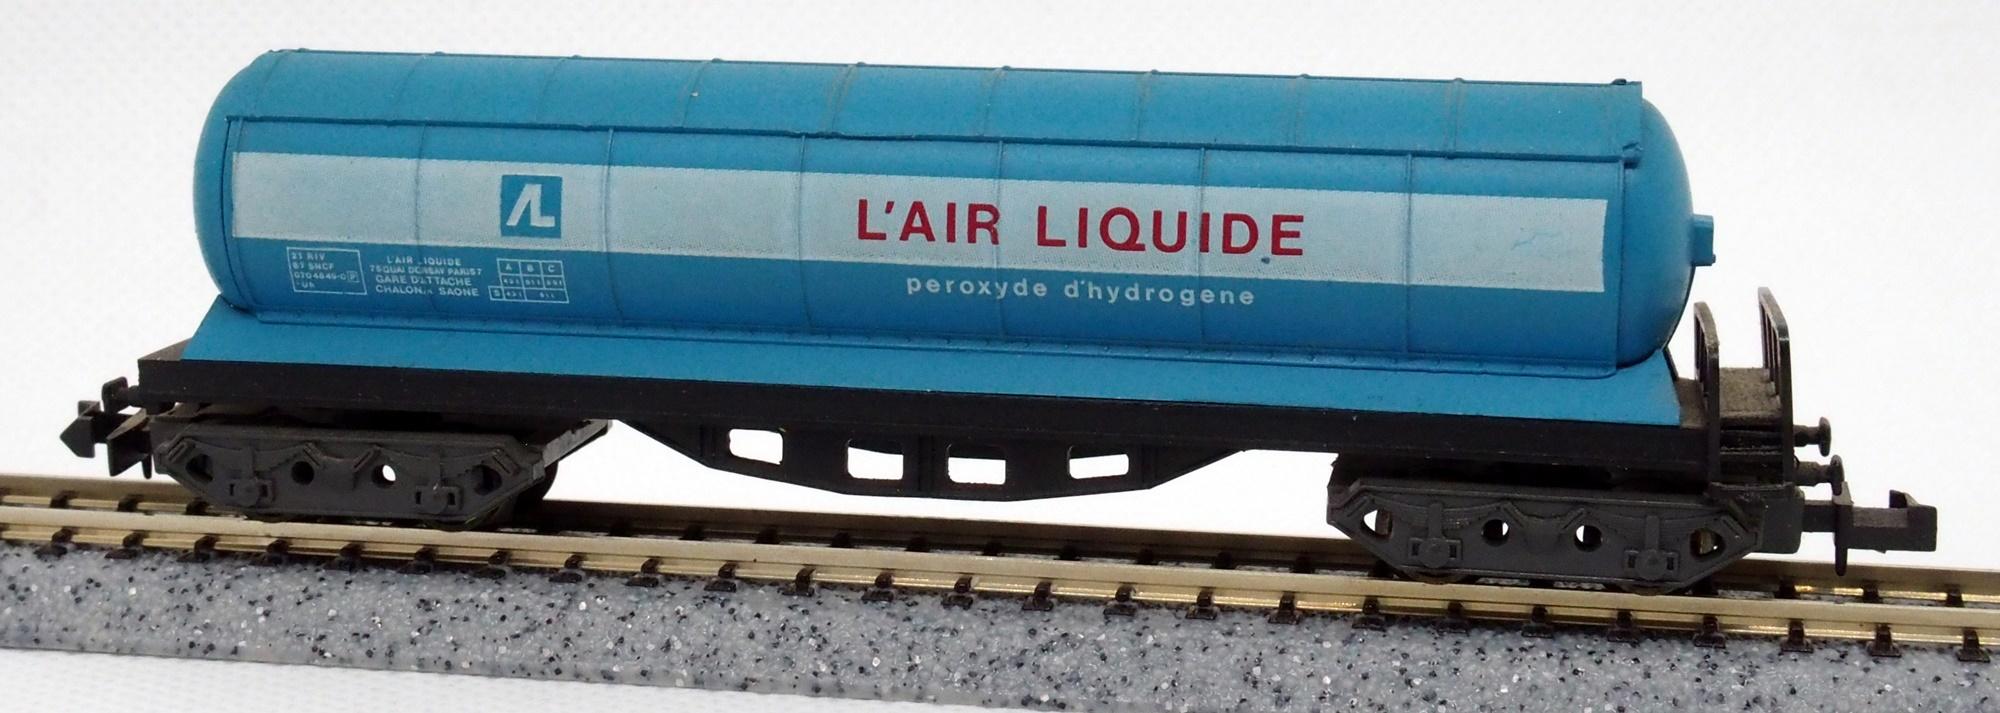 N Scale - Ibertren - 367 - Tank Car, No Dome, Zags Pressurized - Air Liquide - 21 RIV 87 SNCF 070 4849-0